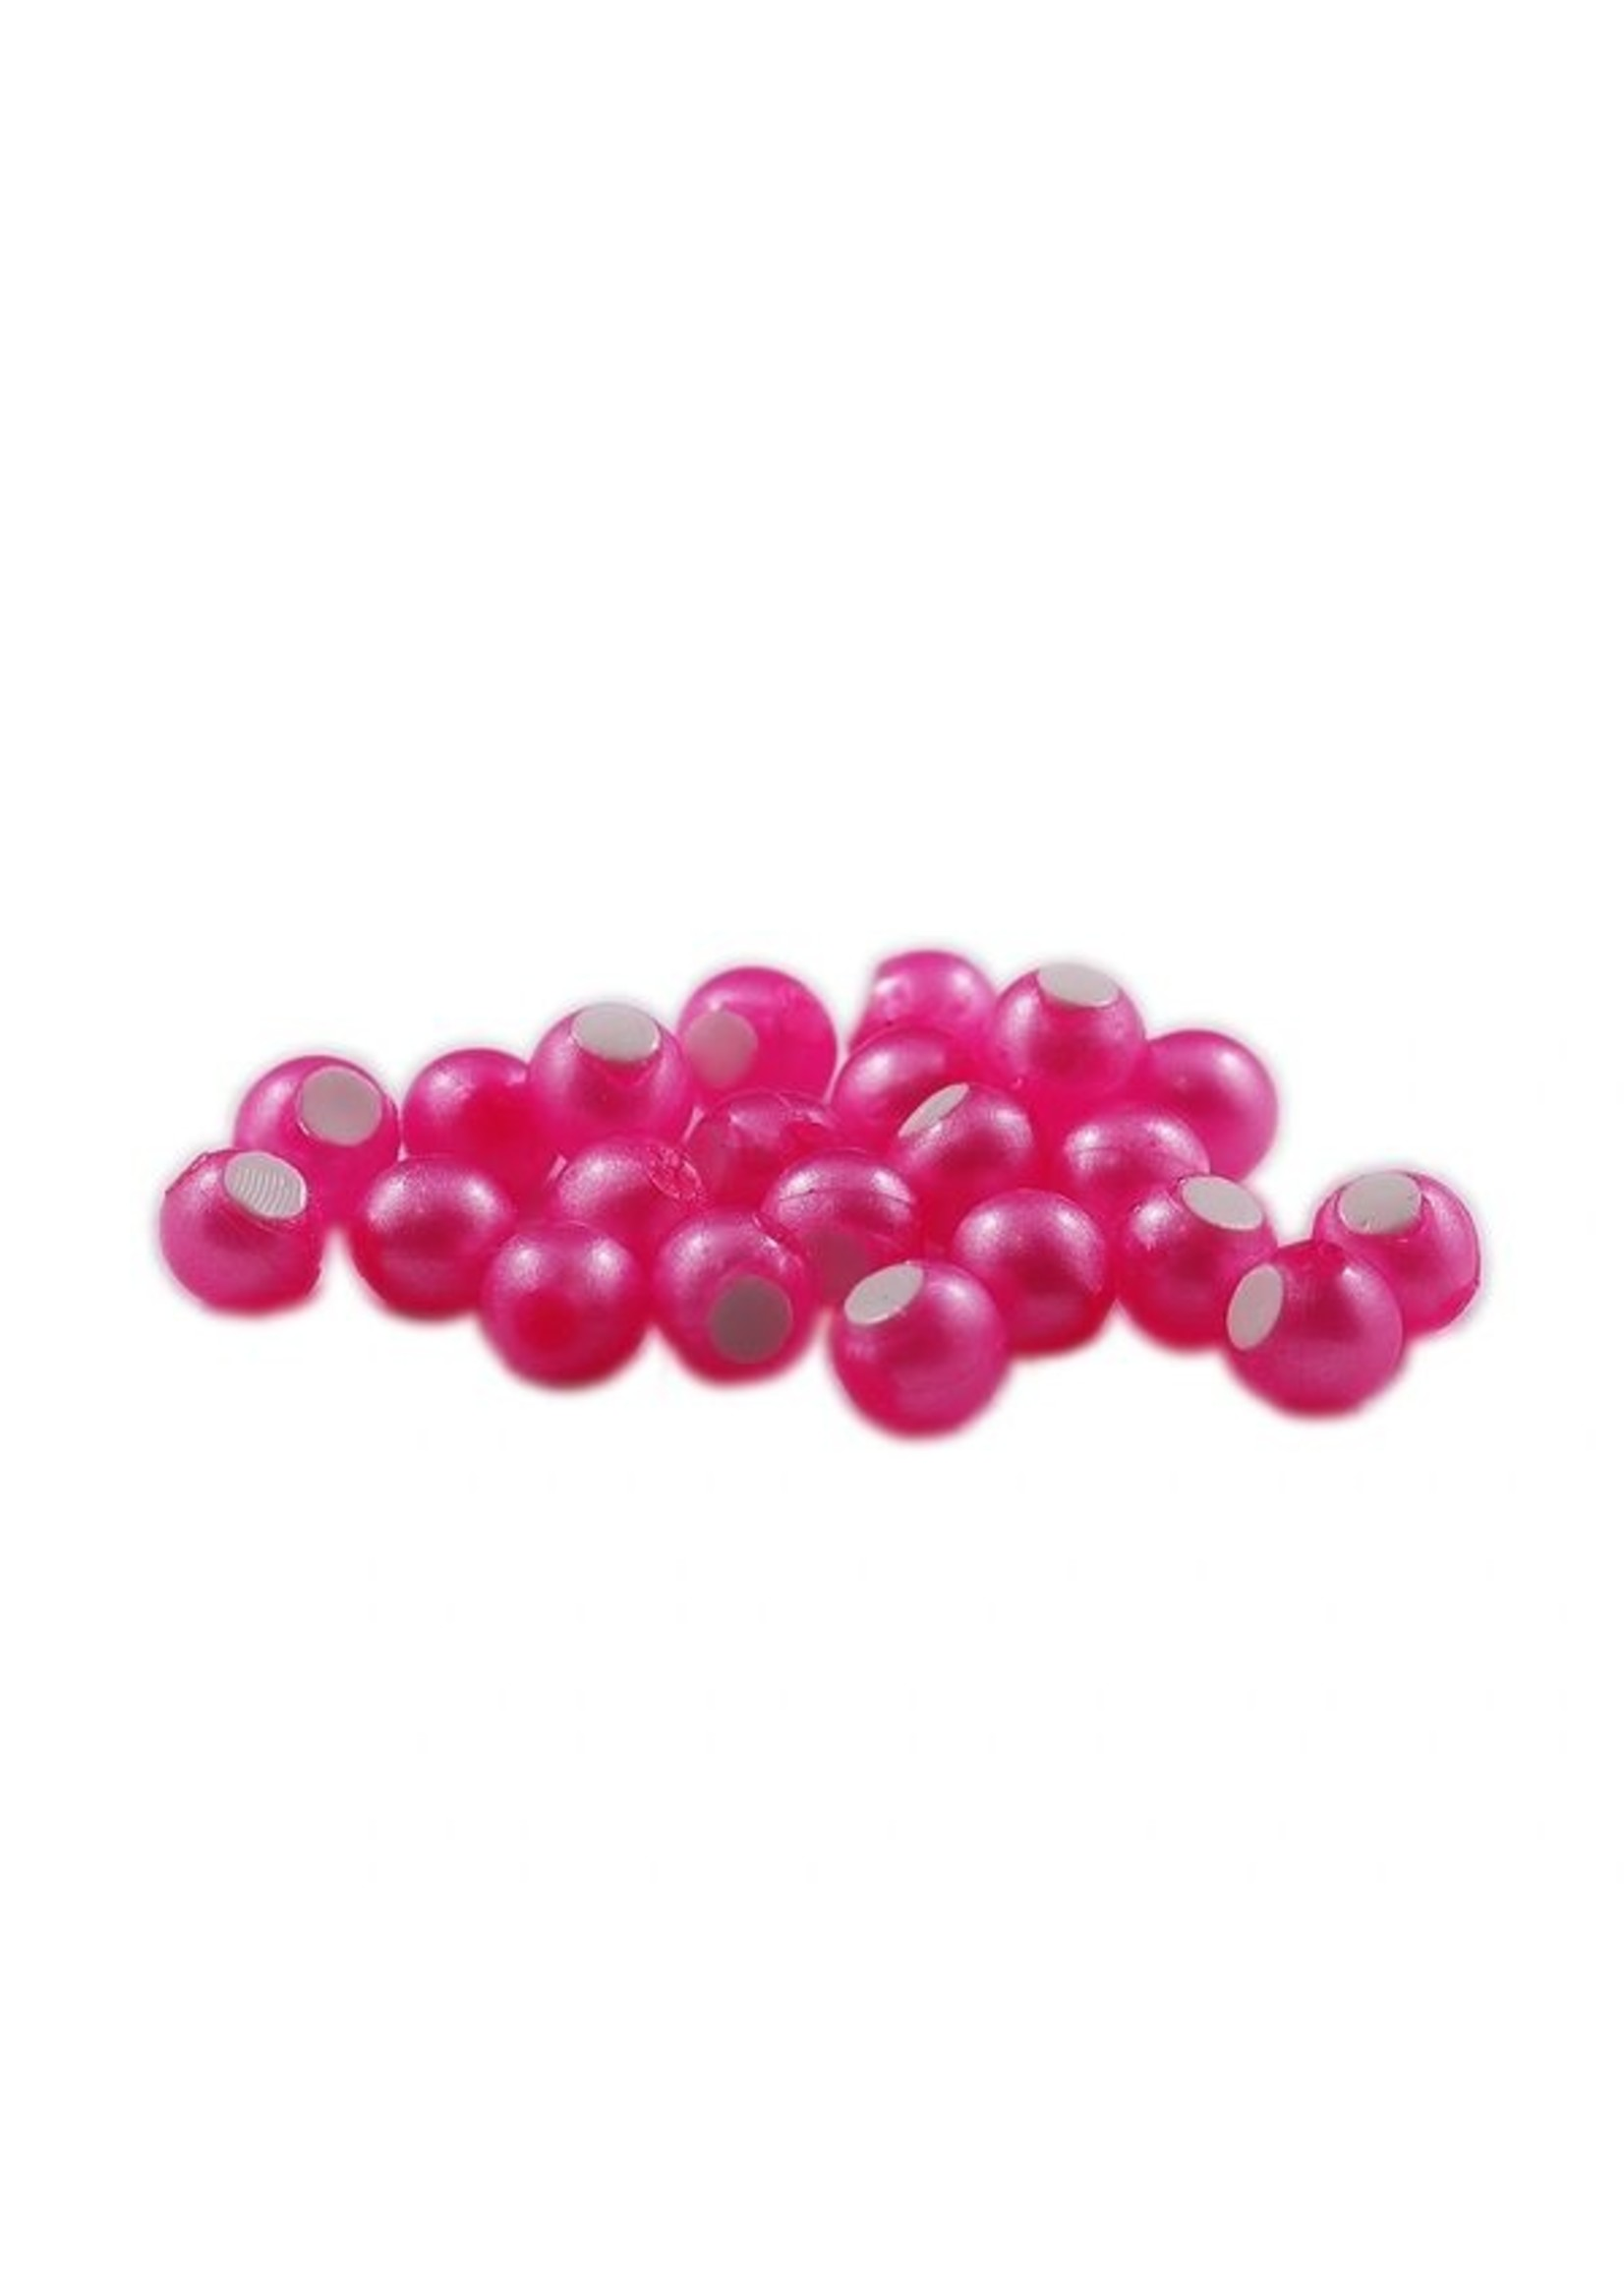 Cleardrift Cleardrift Embryo Soft Beads Pink Pearl w/White Embryo 14mm